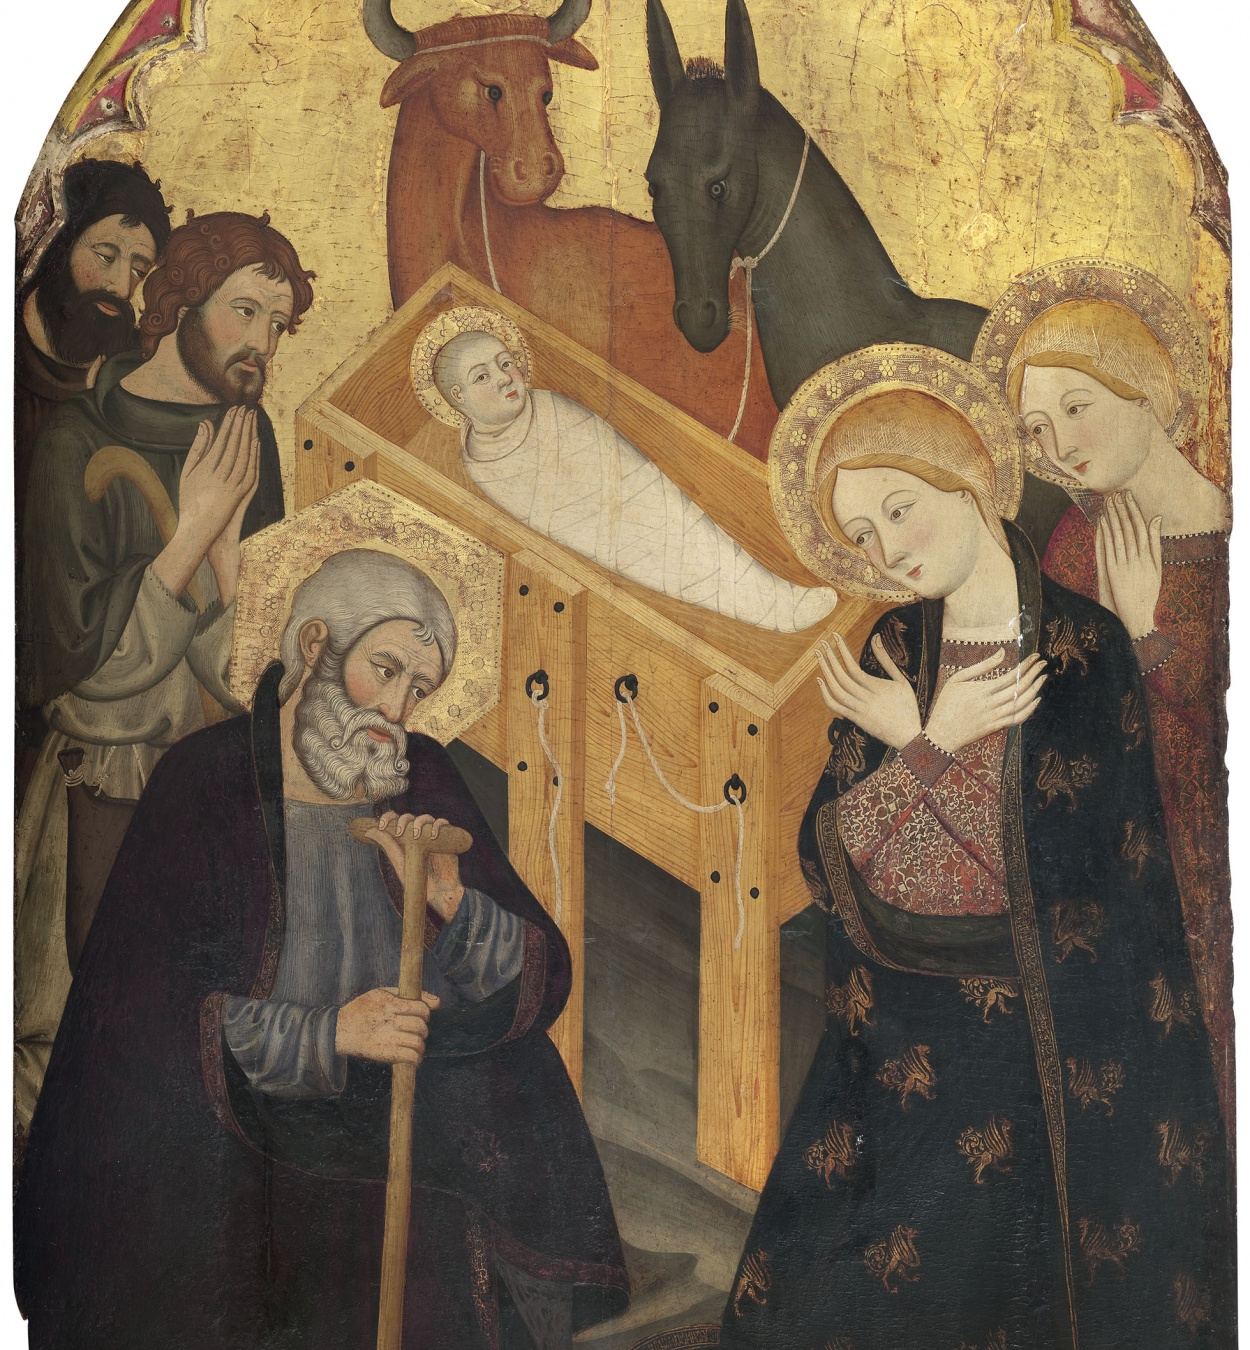 Taller dels germans Serra - Adoration of the Shepherds - Circa 1365-1375